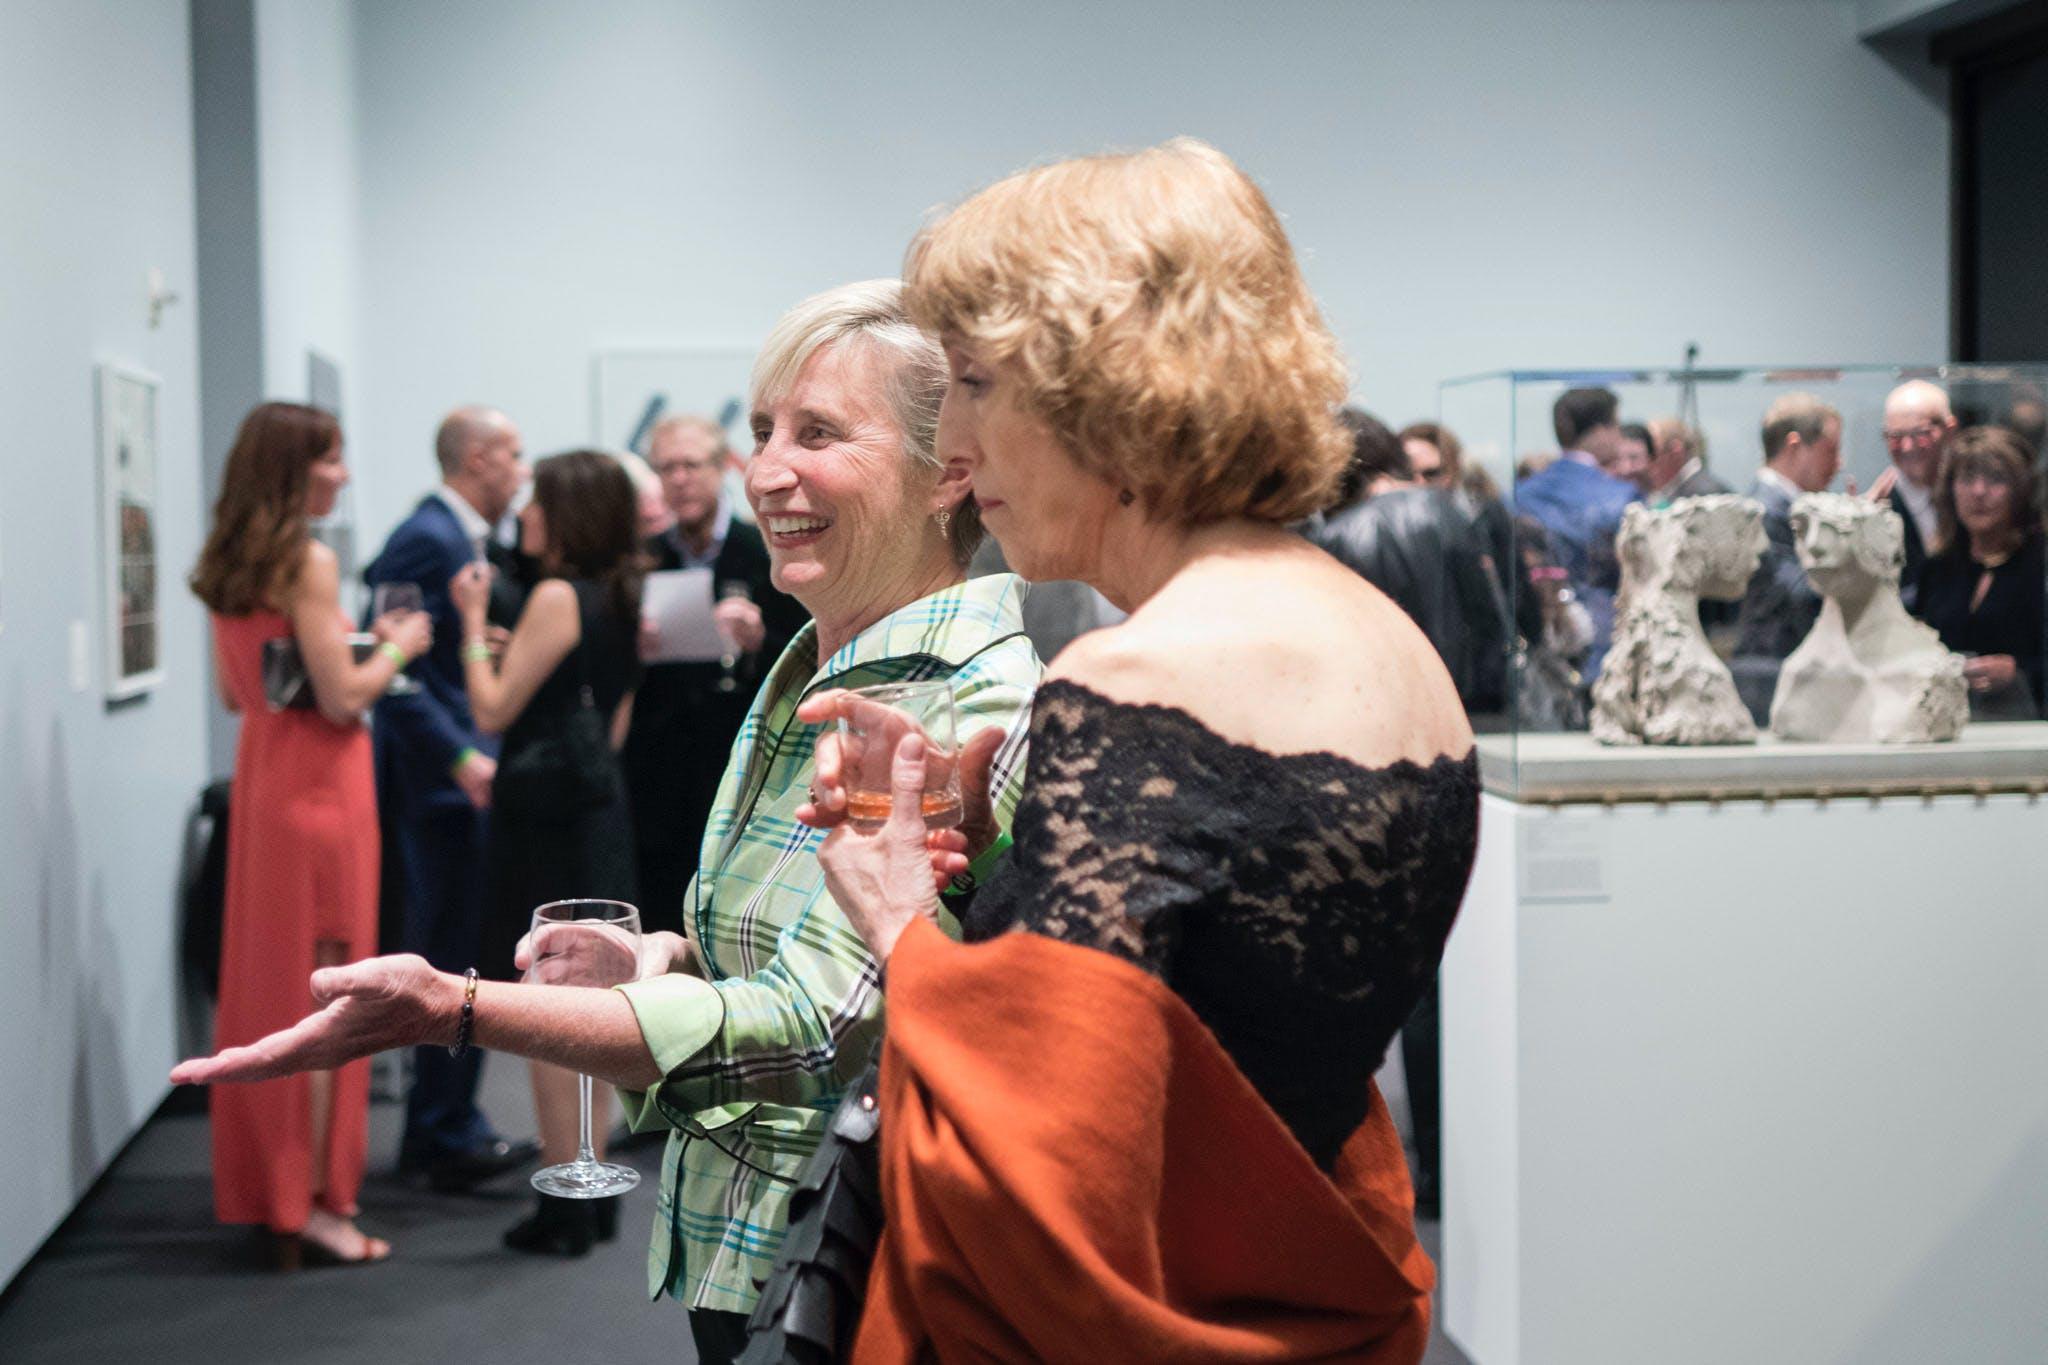 Two women in formal attire viewing exhibit.